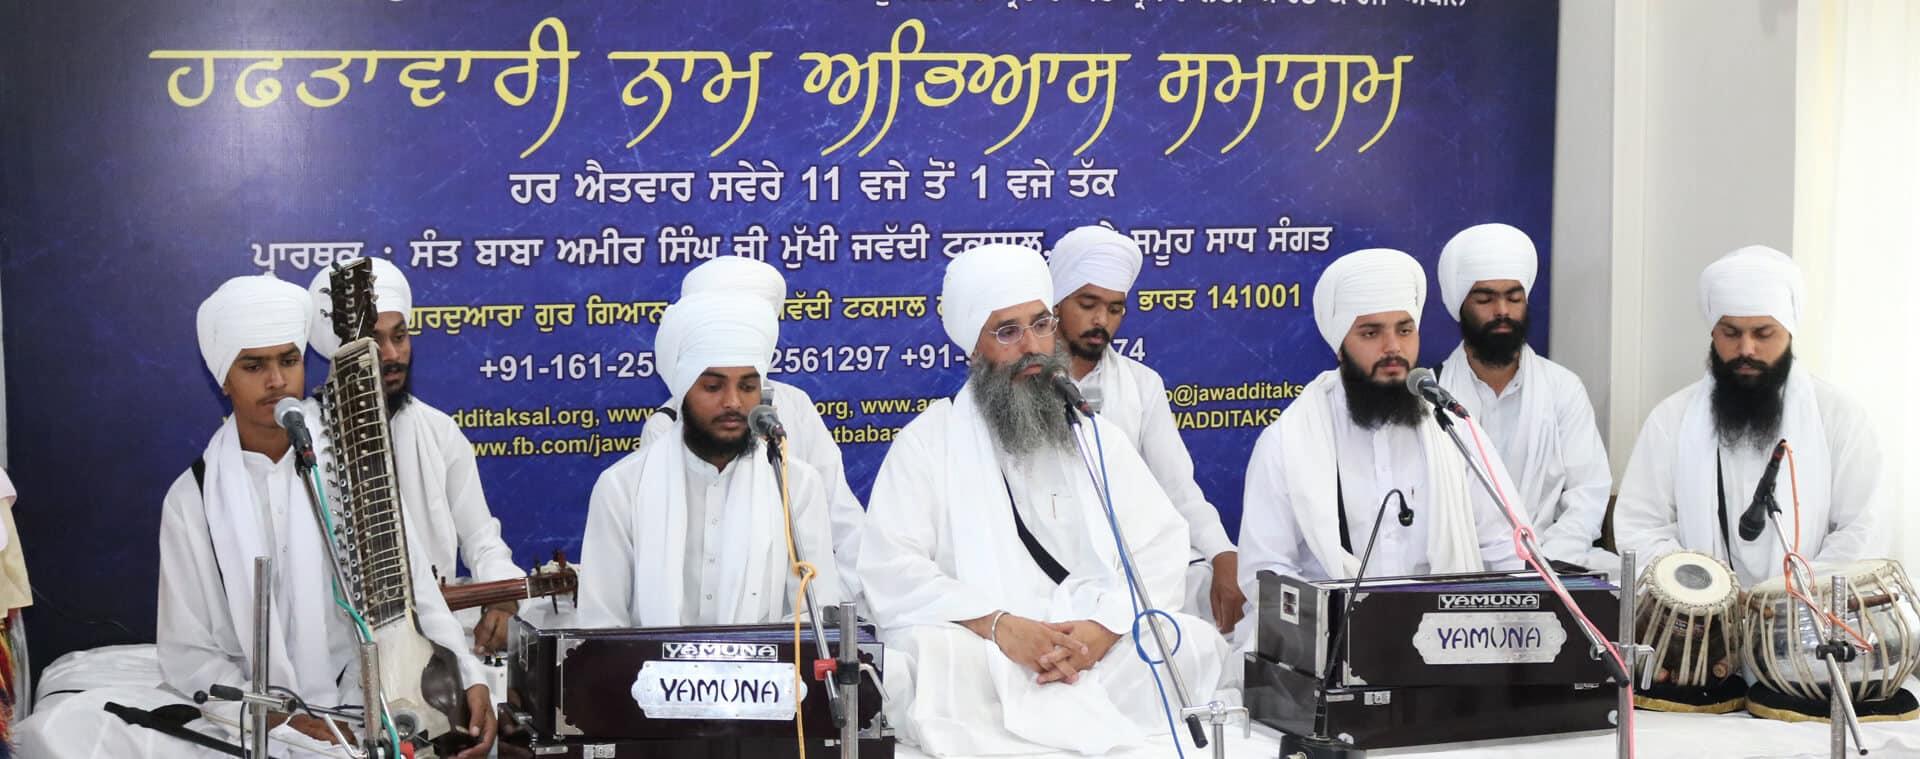 Sant Baba Amir Singh ji Mukhi Jawaddi Taksal